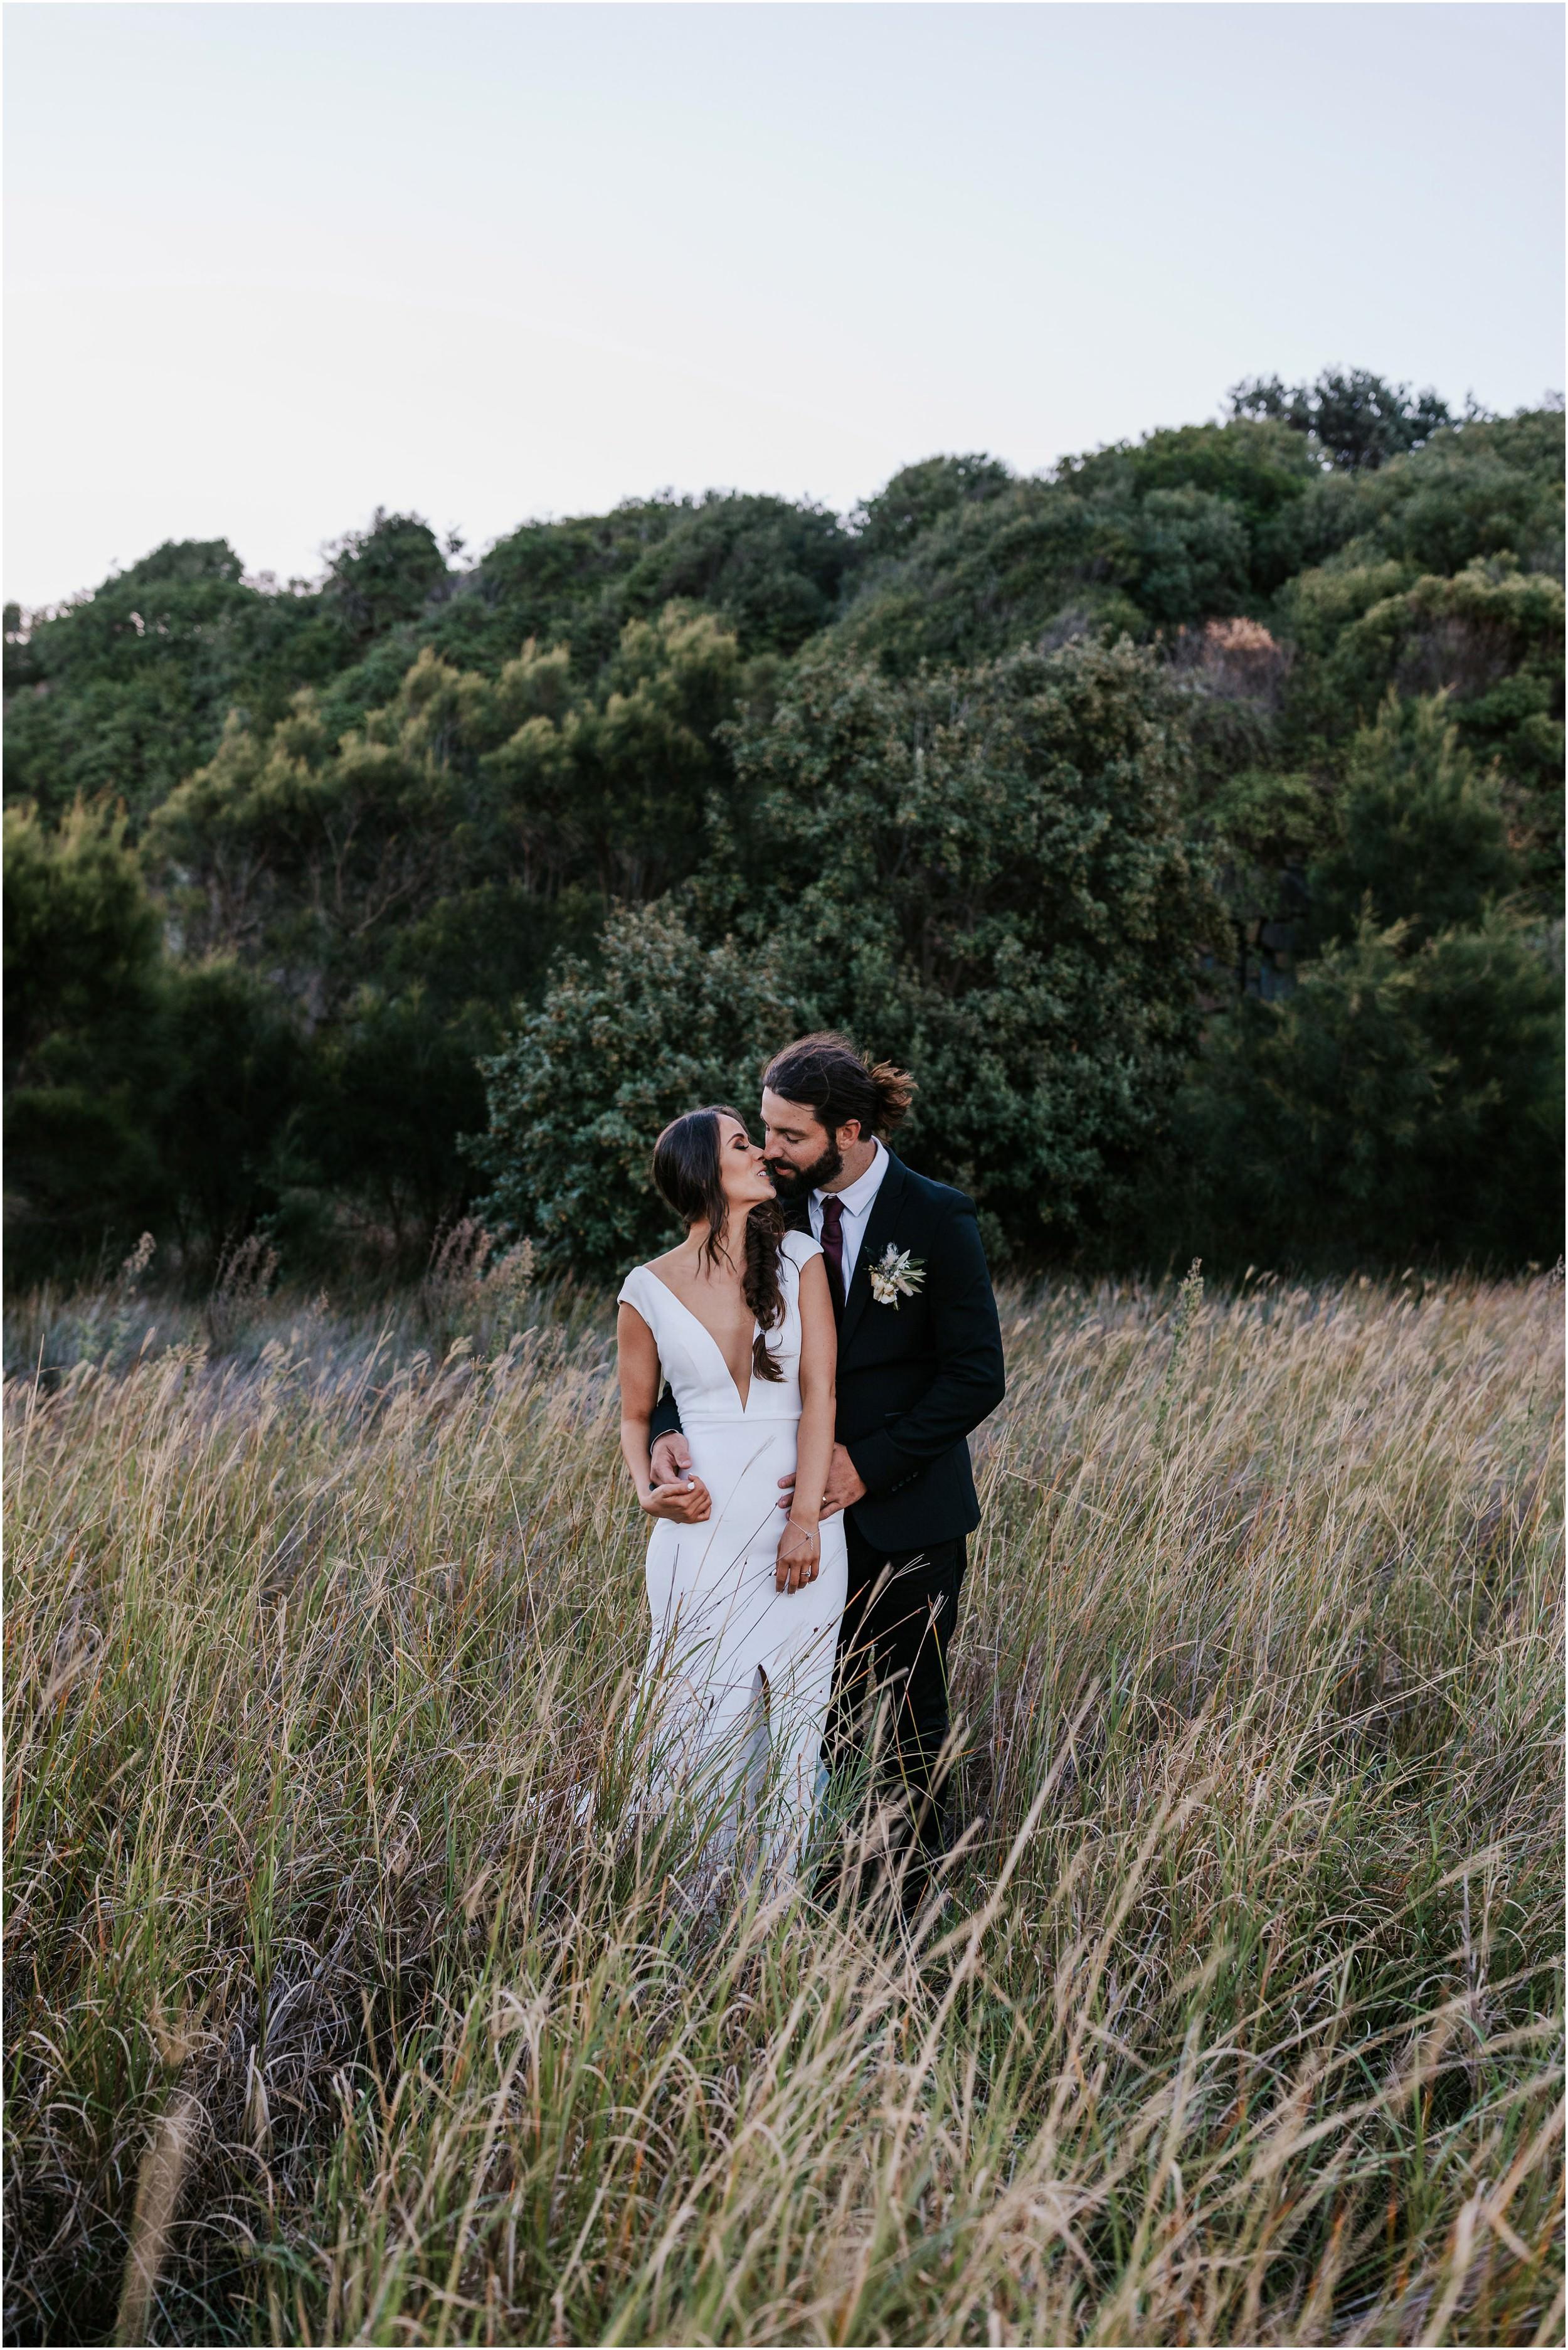 wedding_seacliff_house_alanah_keiran_0115.jpg